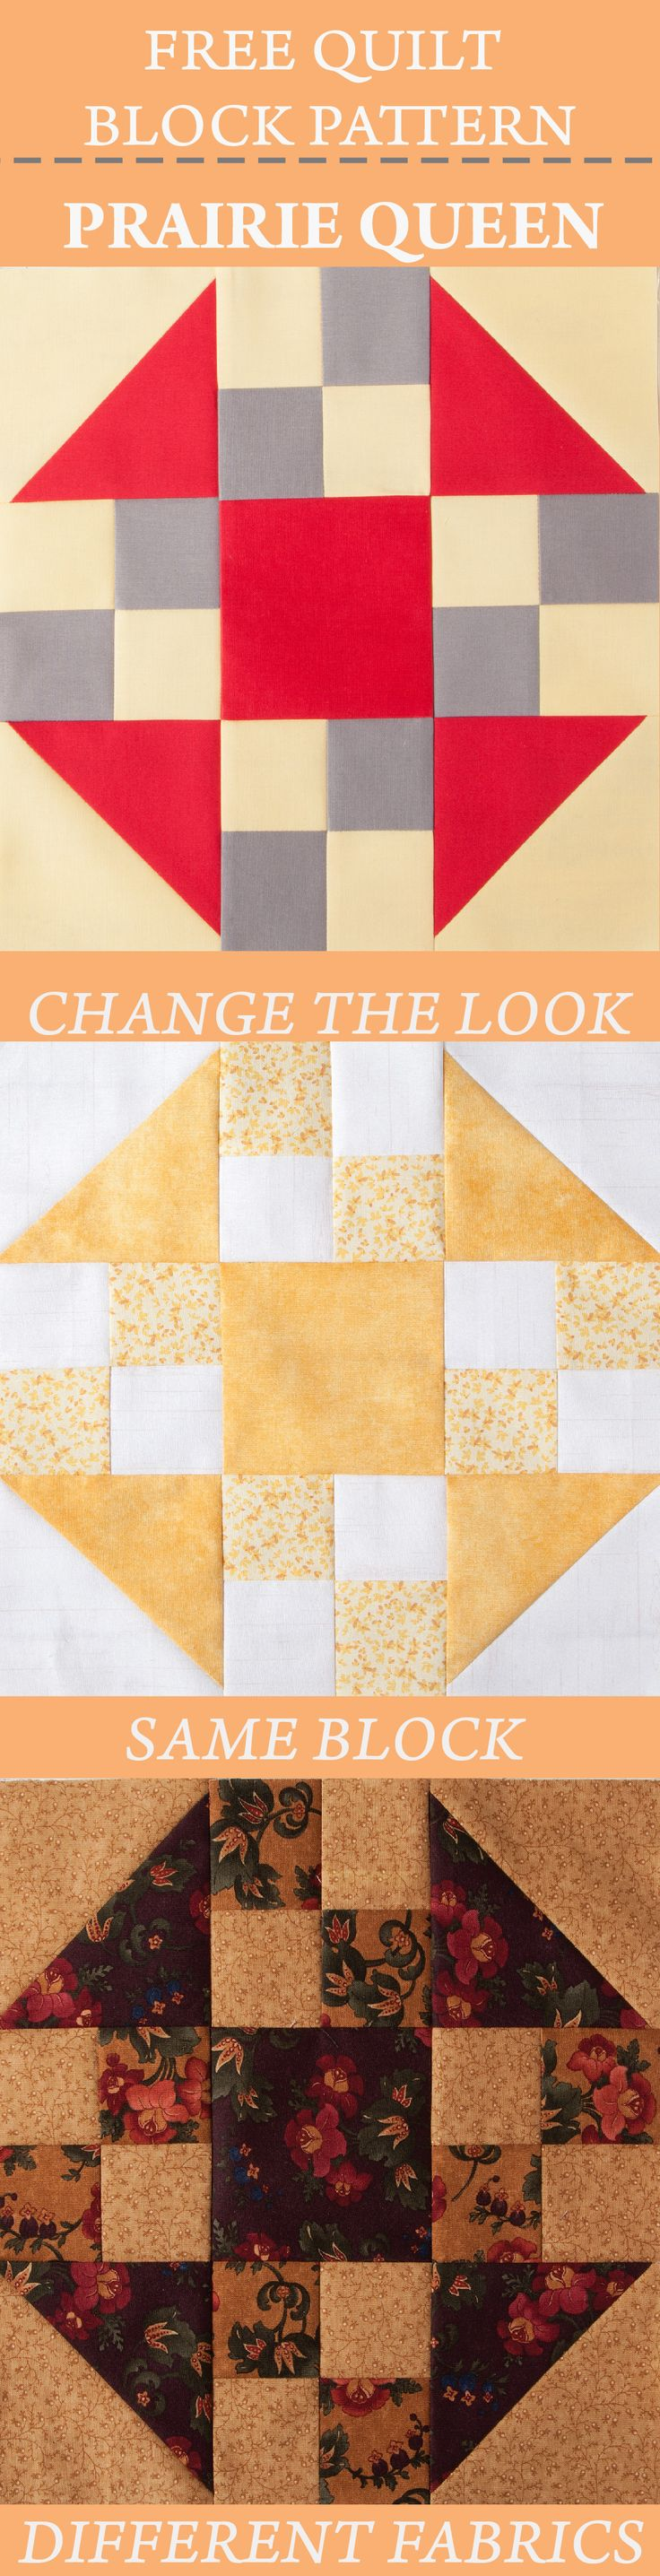 207 best quilt patterns images on Pinterest